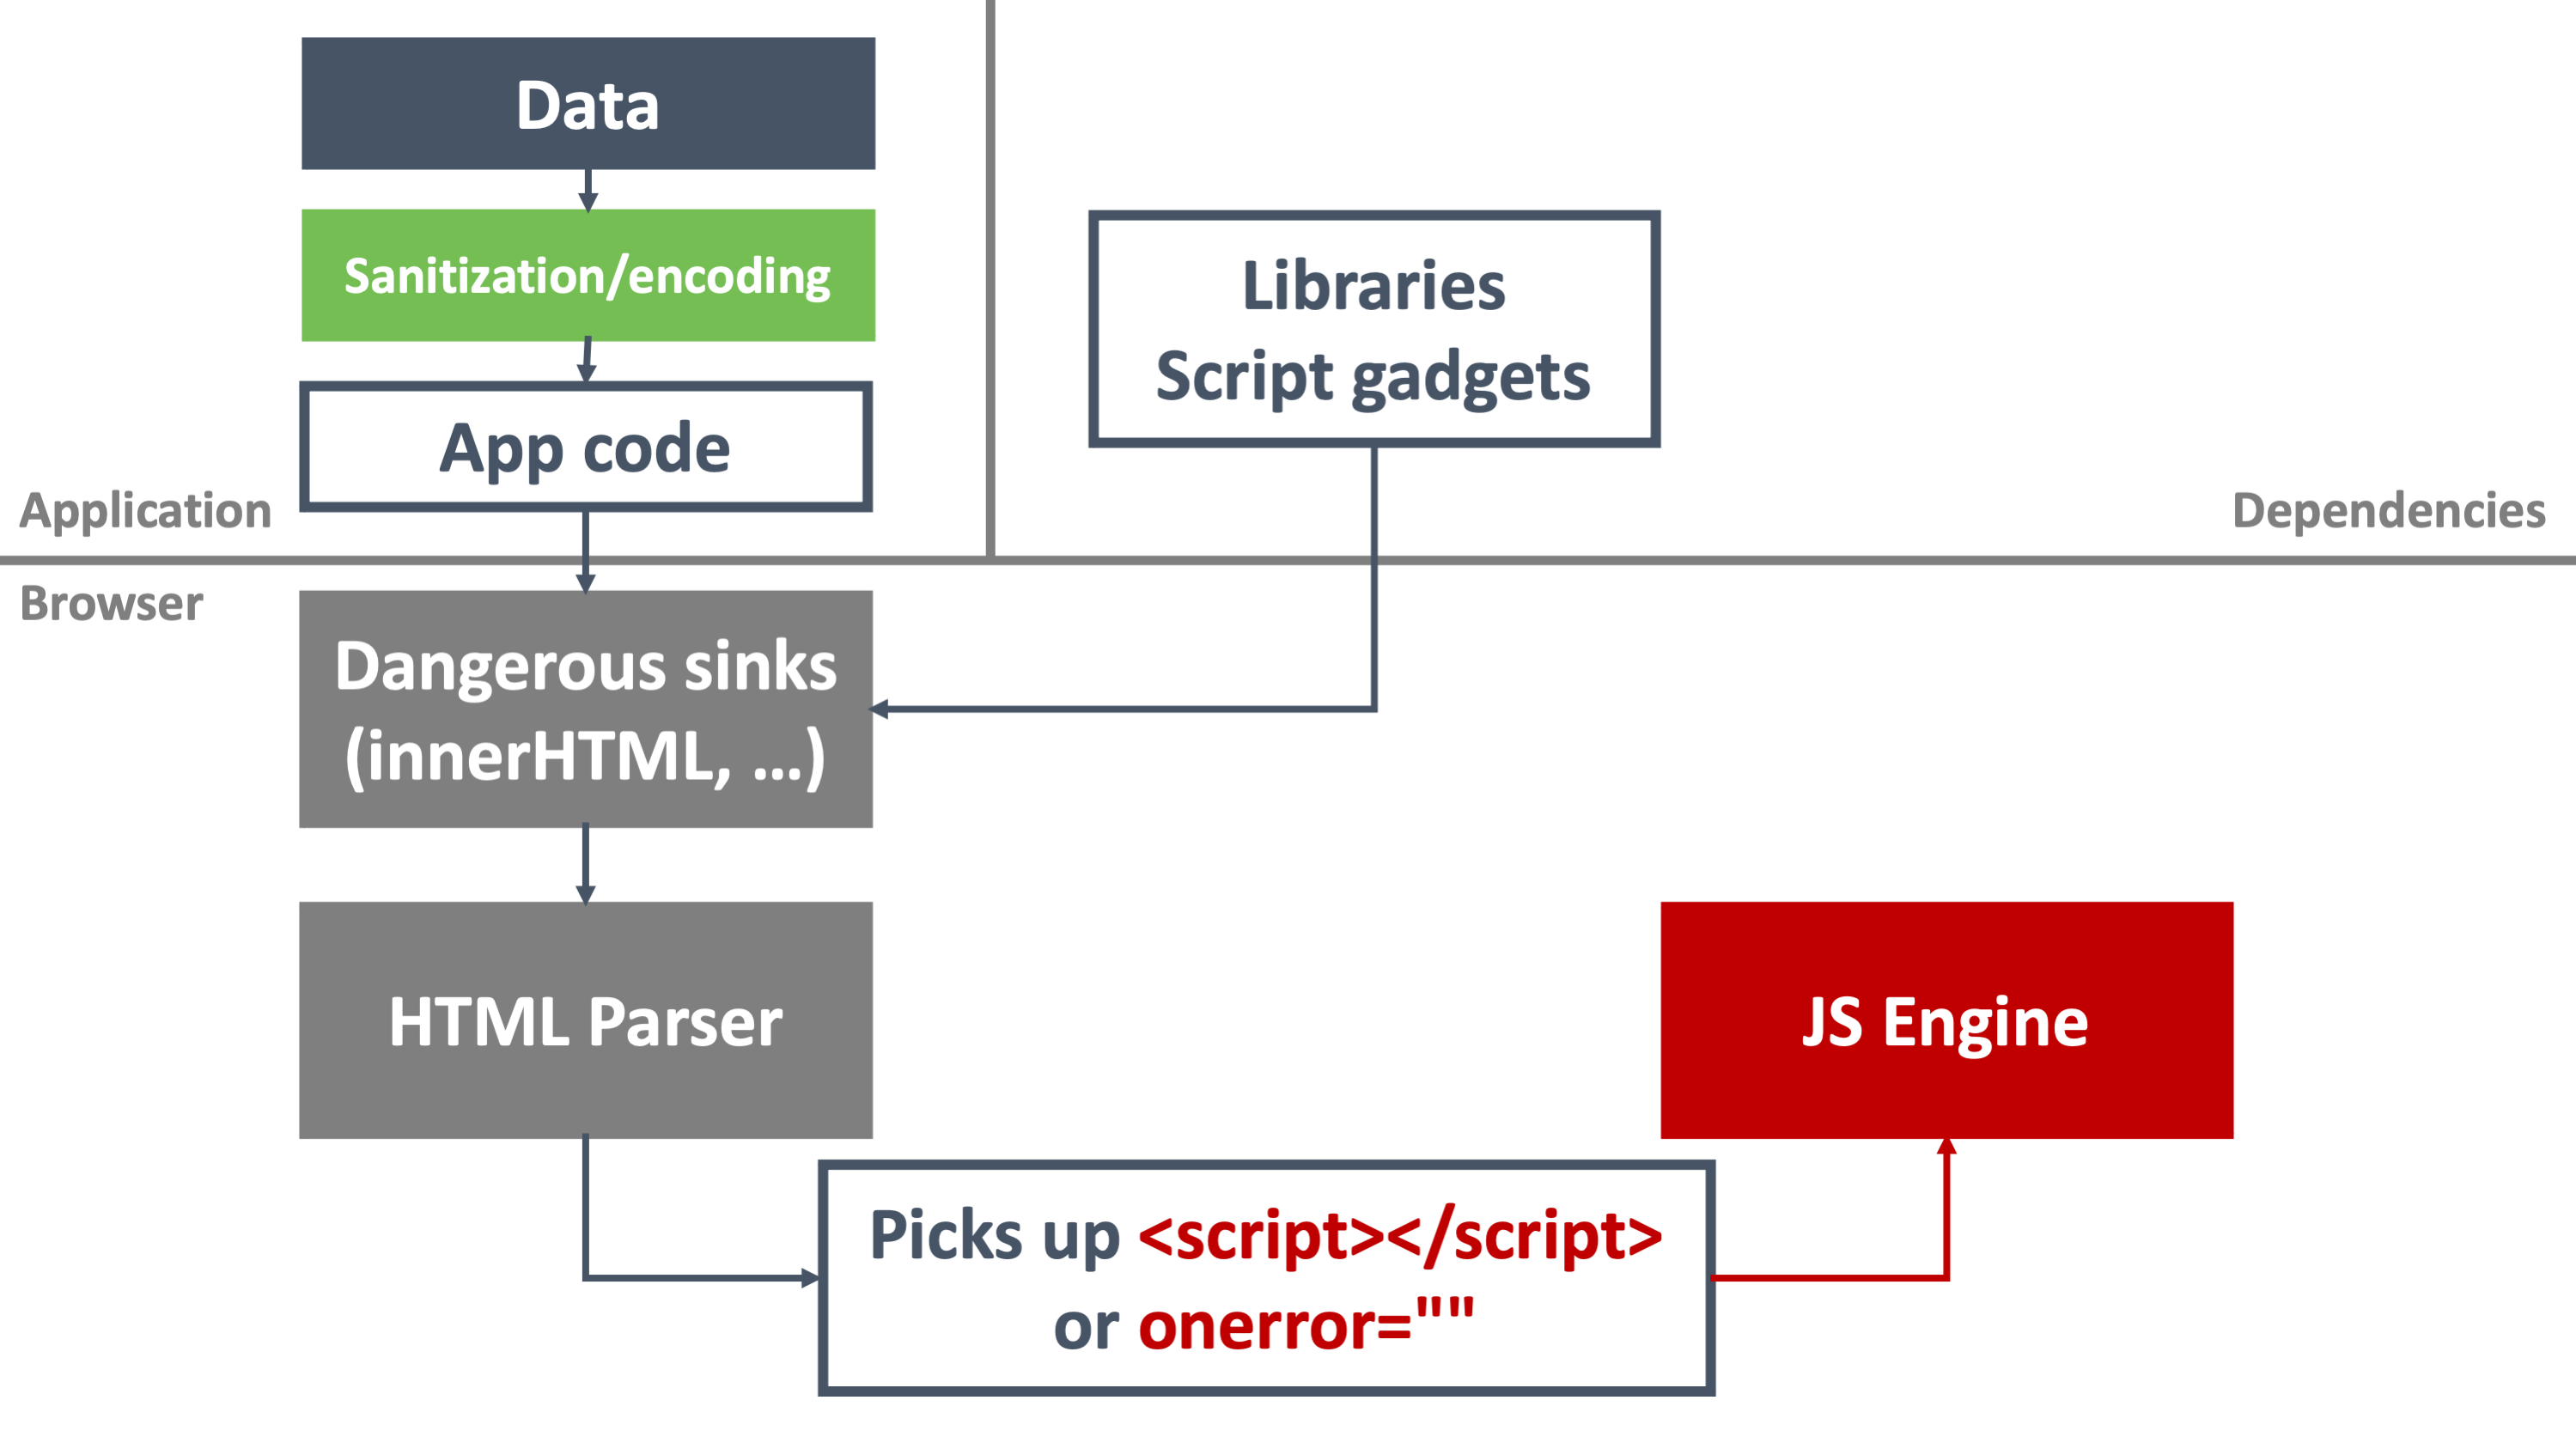 Dangerous sinks and malicious JavaScript code